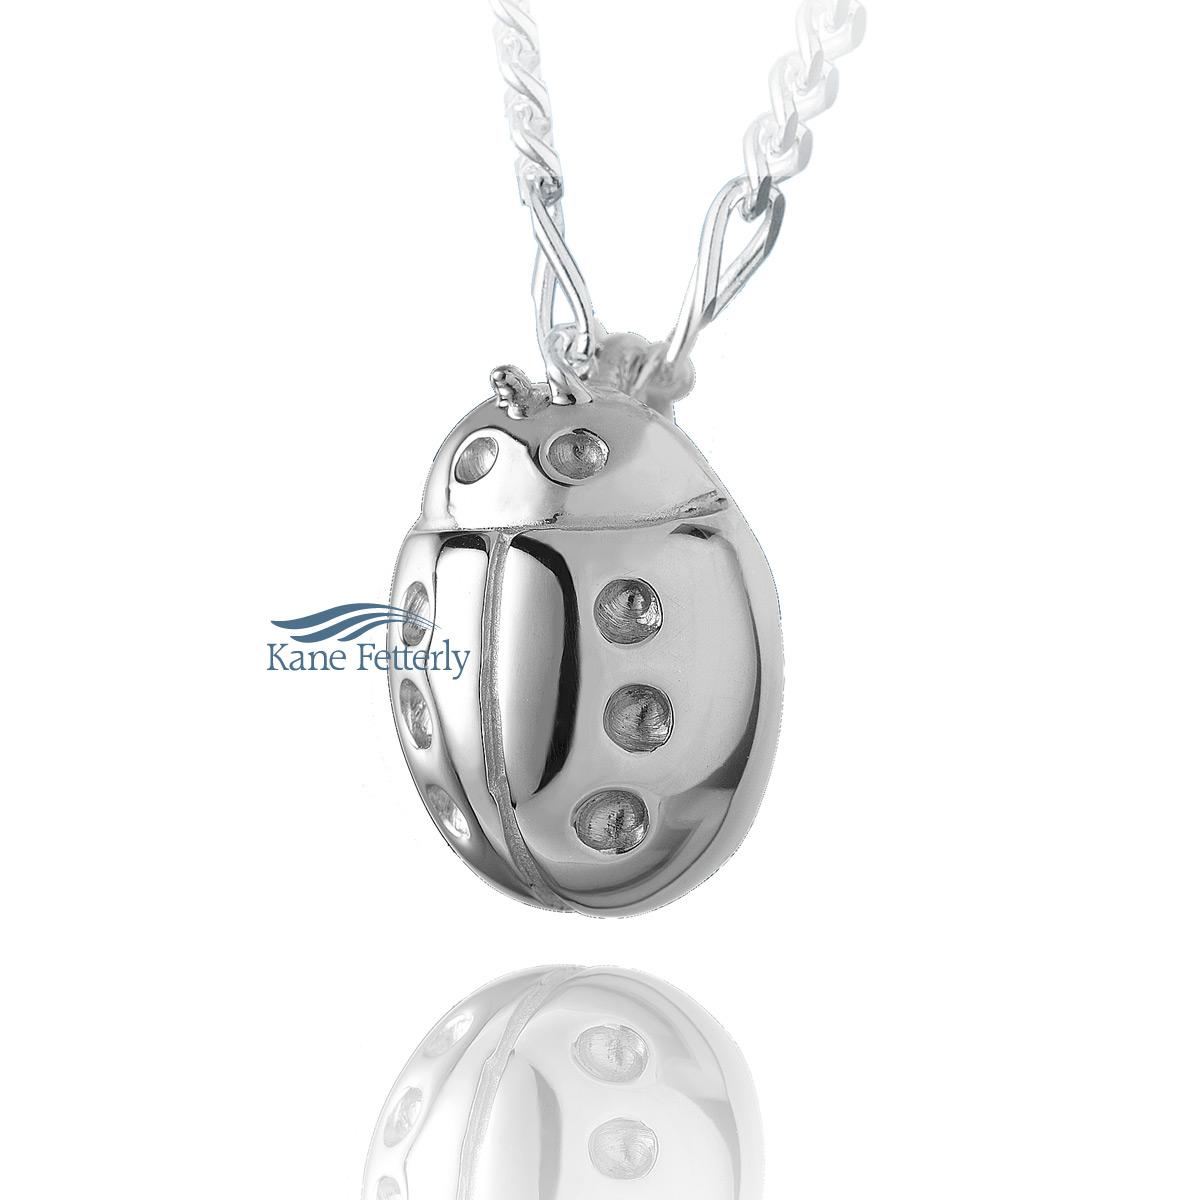 J0107 Ladybug pendant in sterling silver